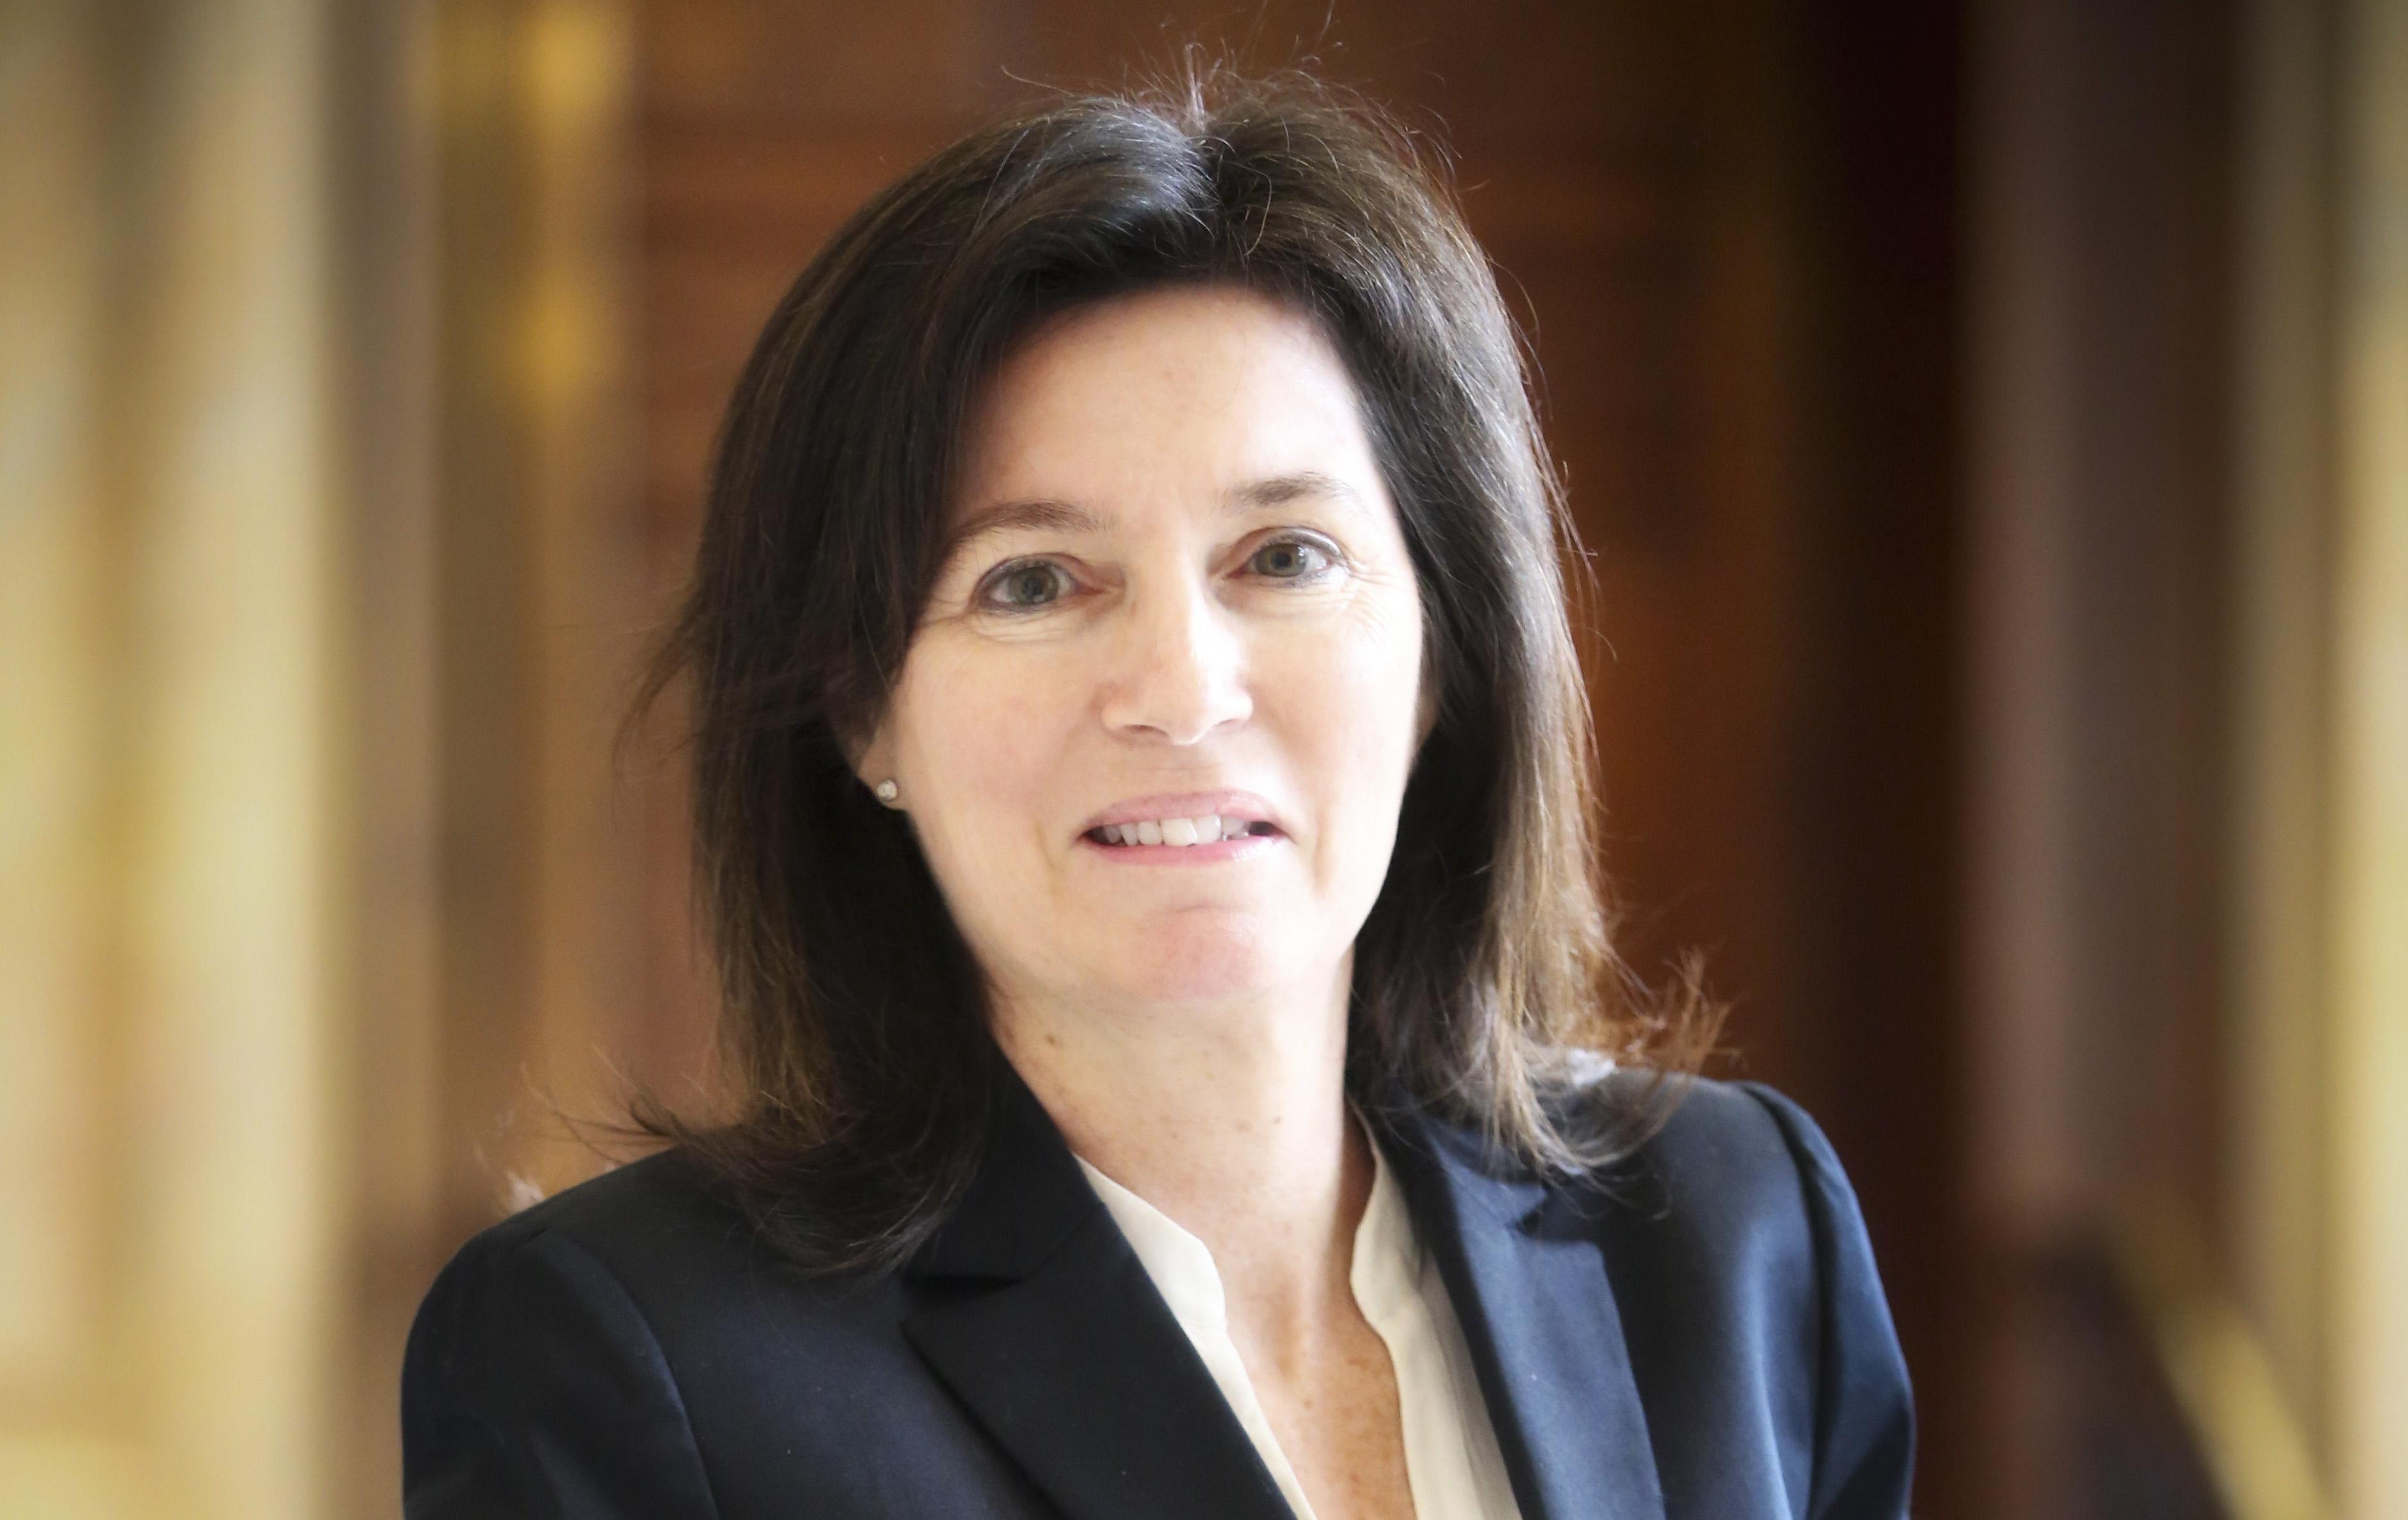 Cristina de Parias, la gran esperanza de FG para rehabilitar la agónica red comercial de BBVA en España